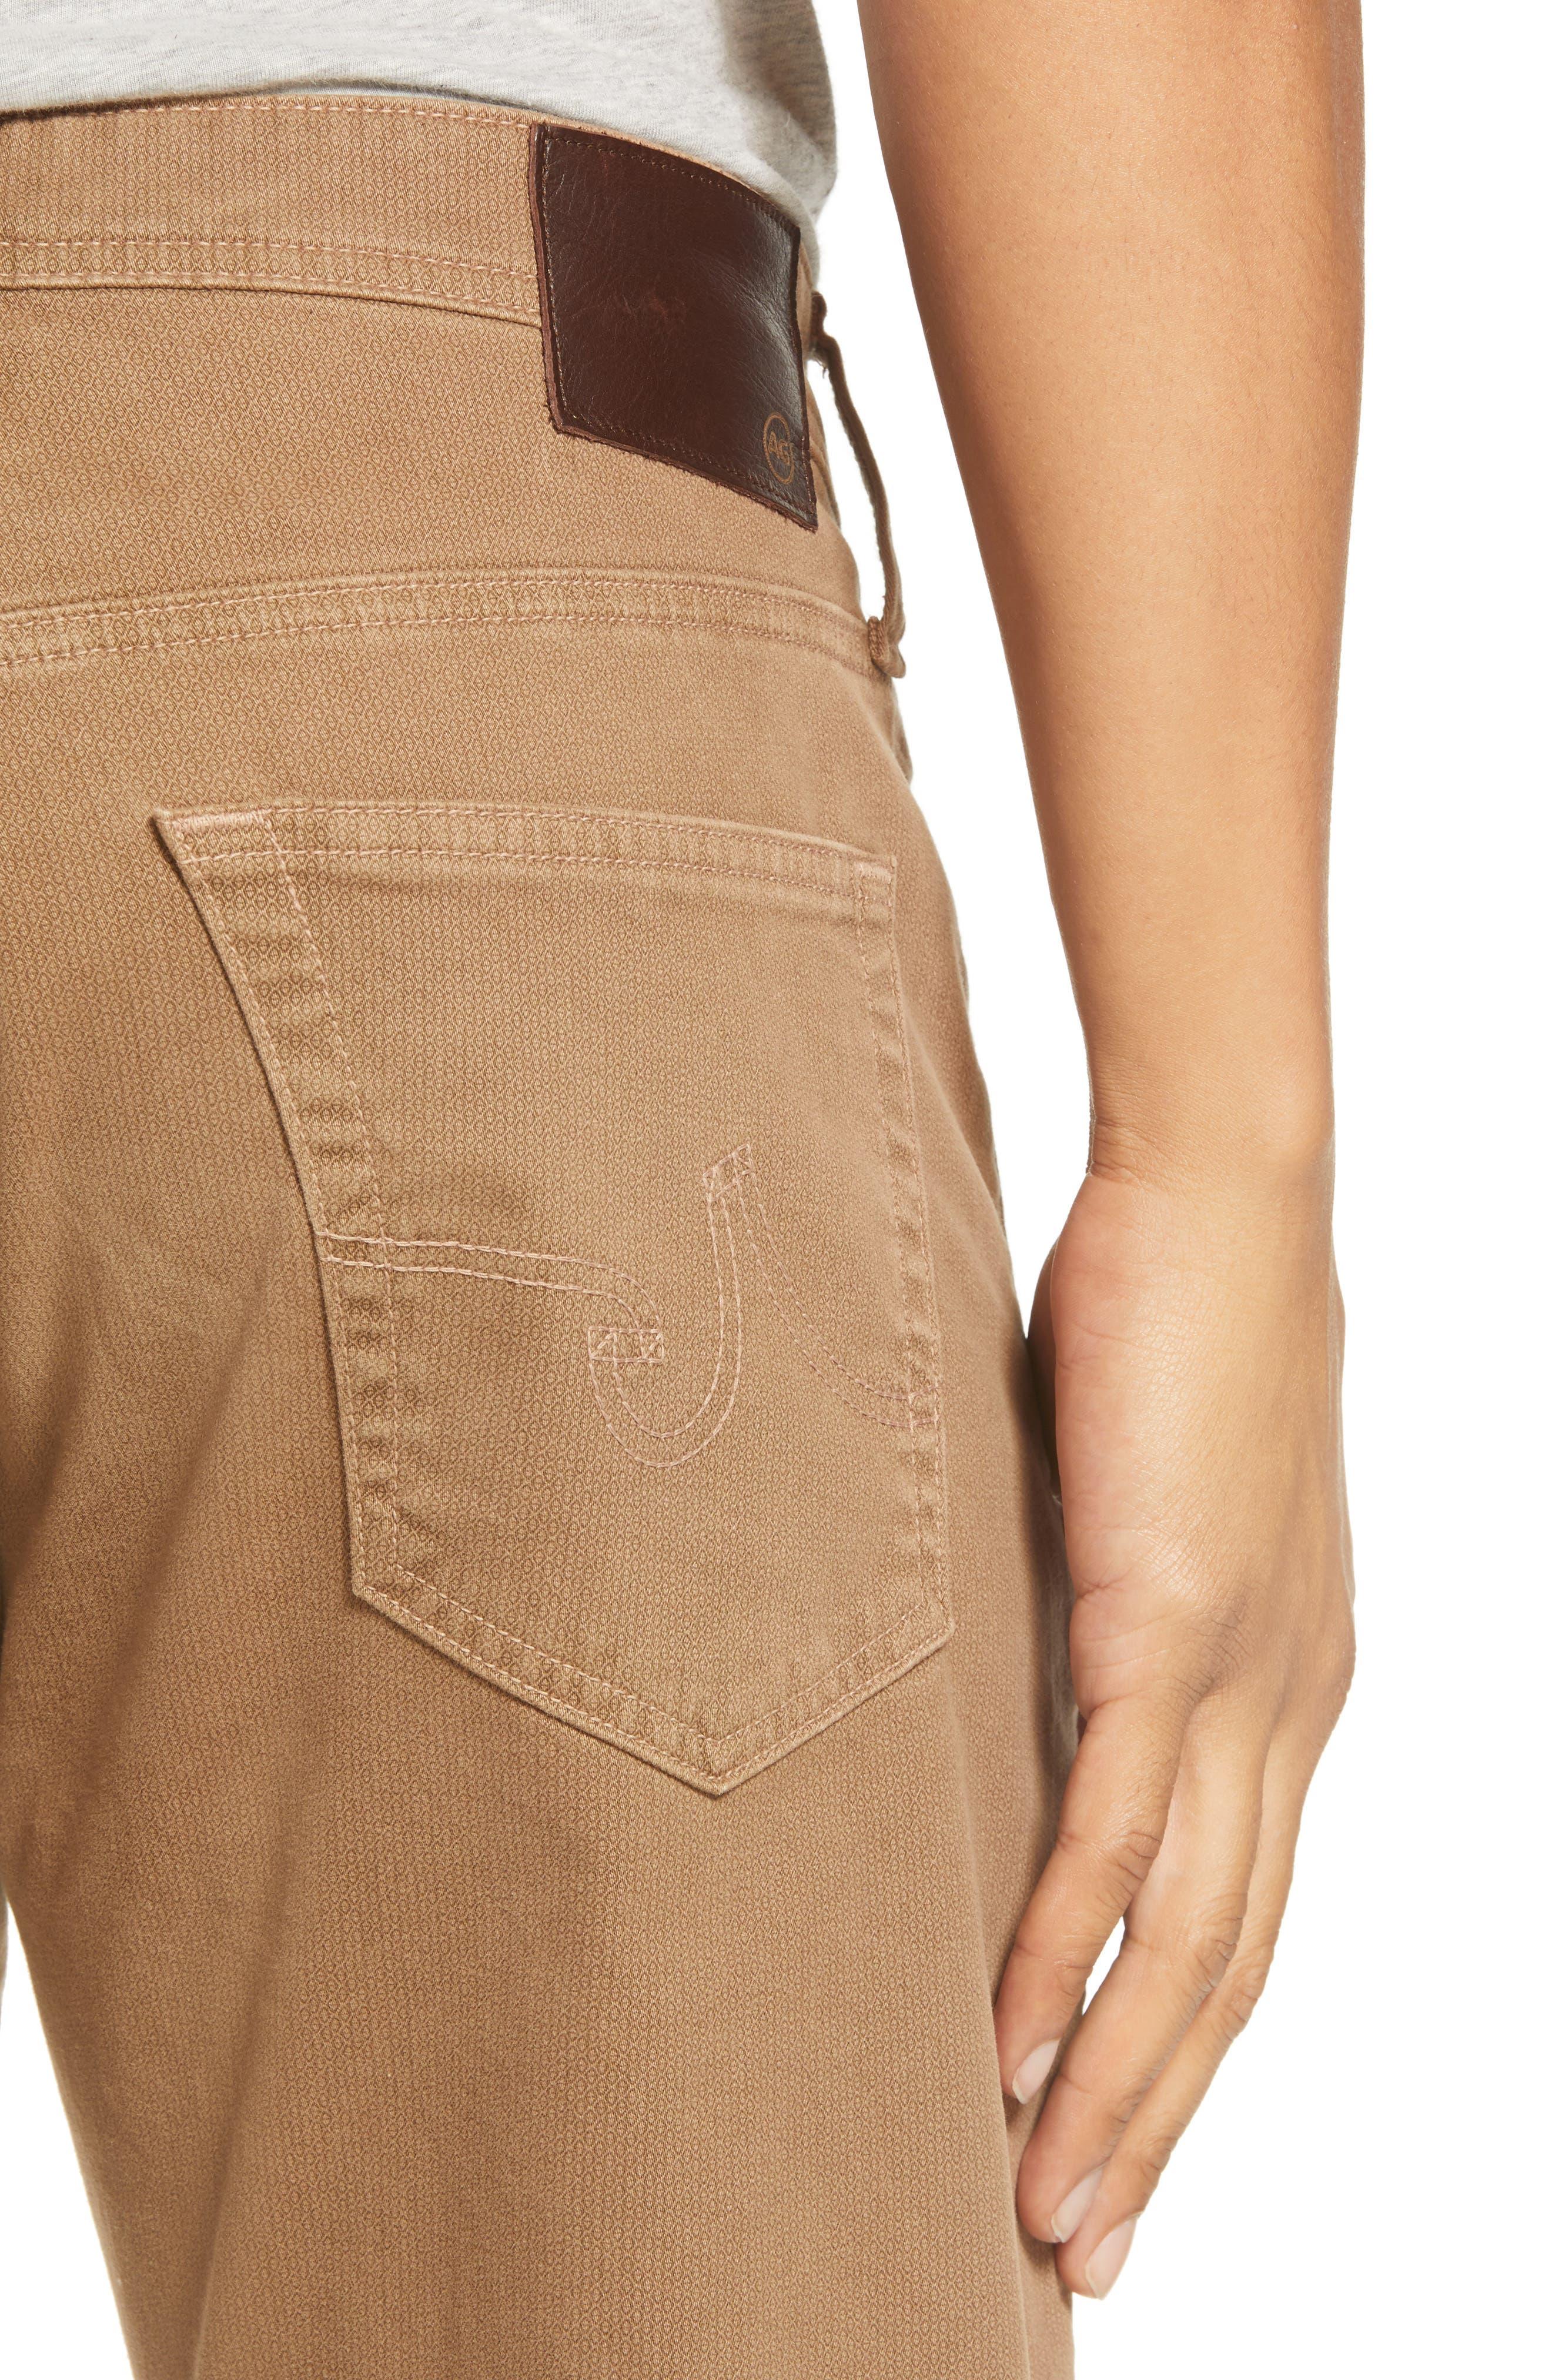 Everett SUD Print Slim Straight Leg Pants,                             Alternate thumbnail 4, color,                             MICRO GEO WHEAT